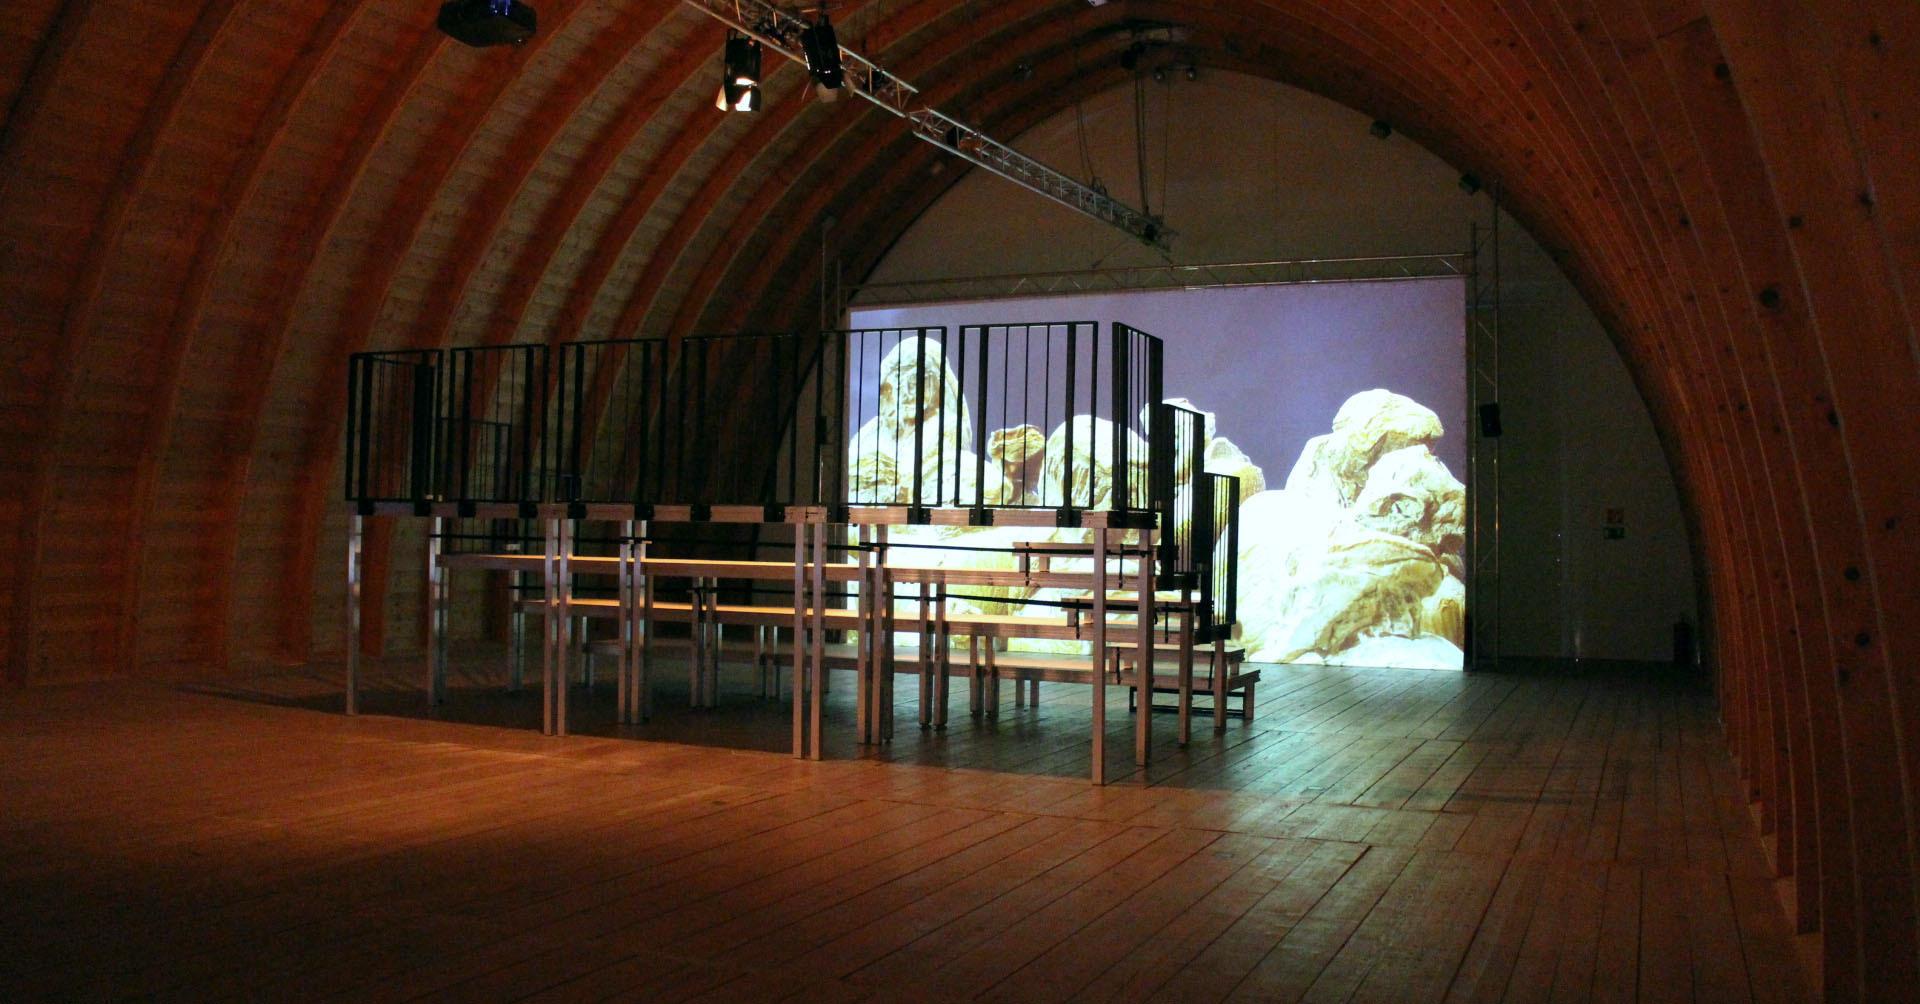 Schafhof - Ausstellung - Kutscher